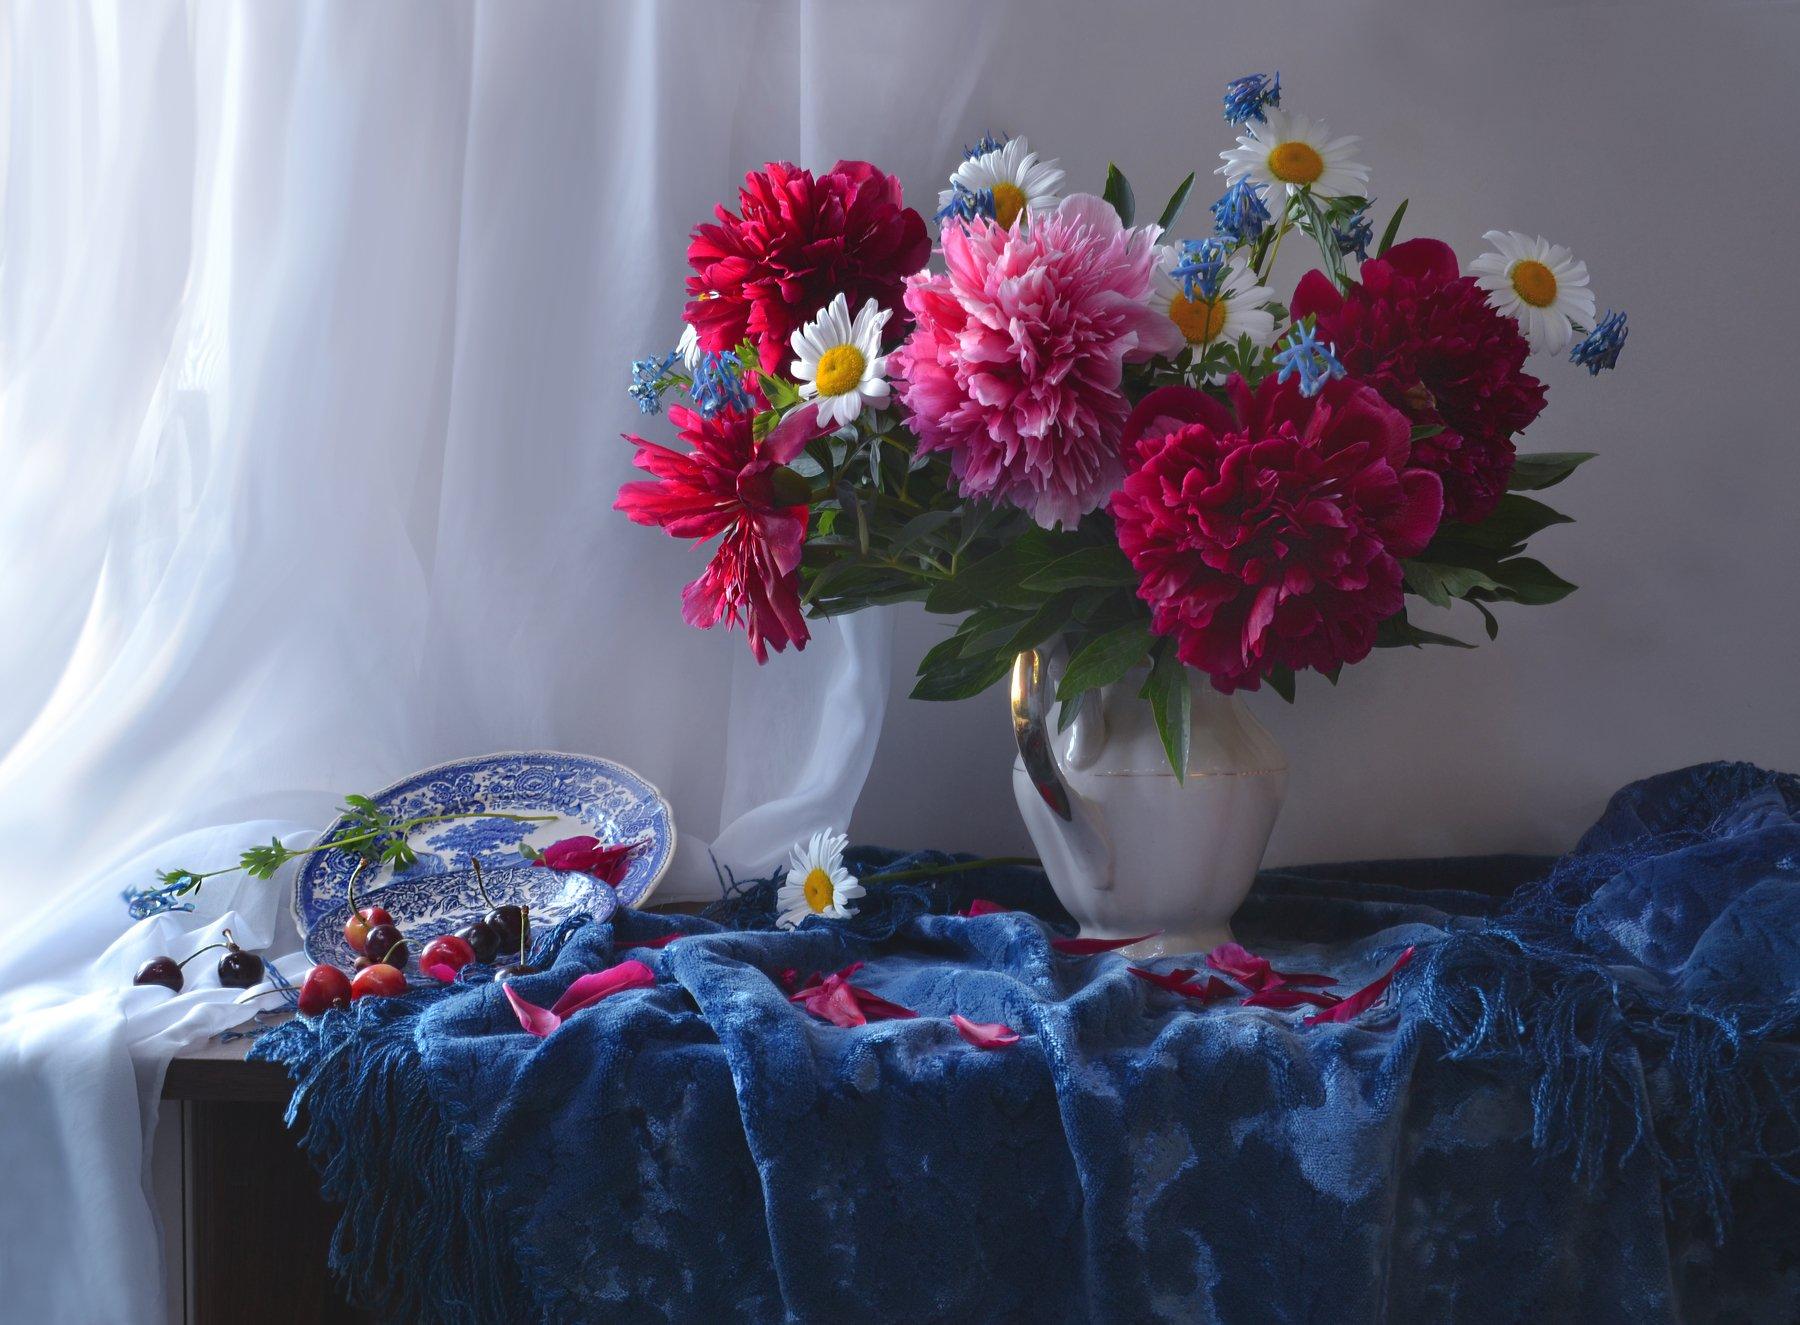 still life,натюрморт, цветы, фото натюрморт, фарфор, ромашки, пионы, лето, июнь, вишня, Колова Валентина